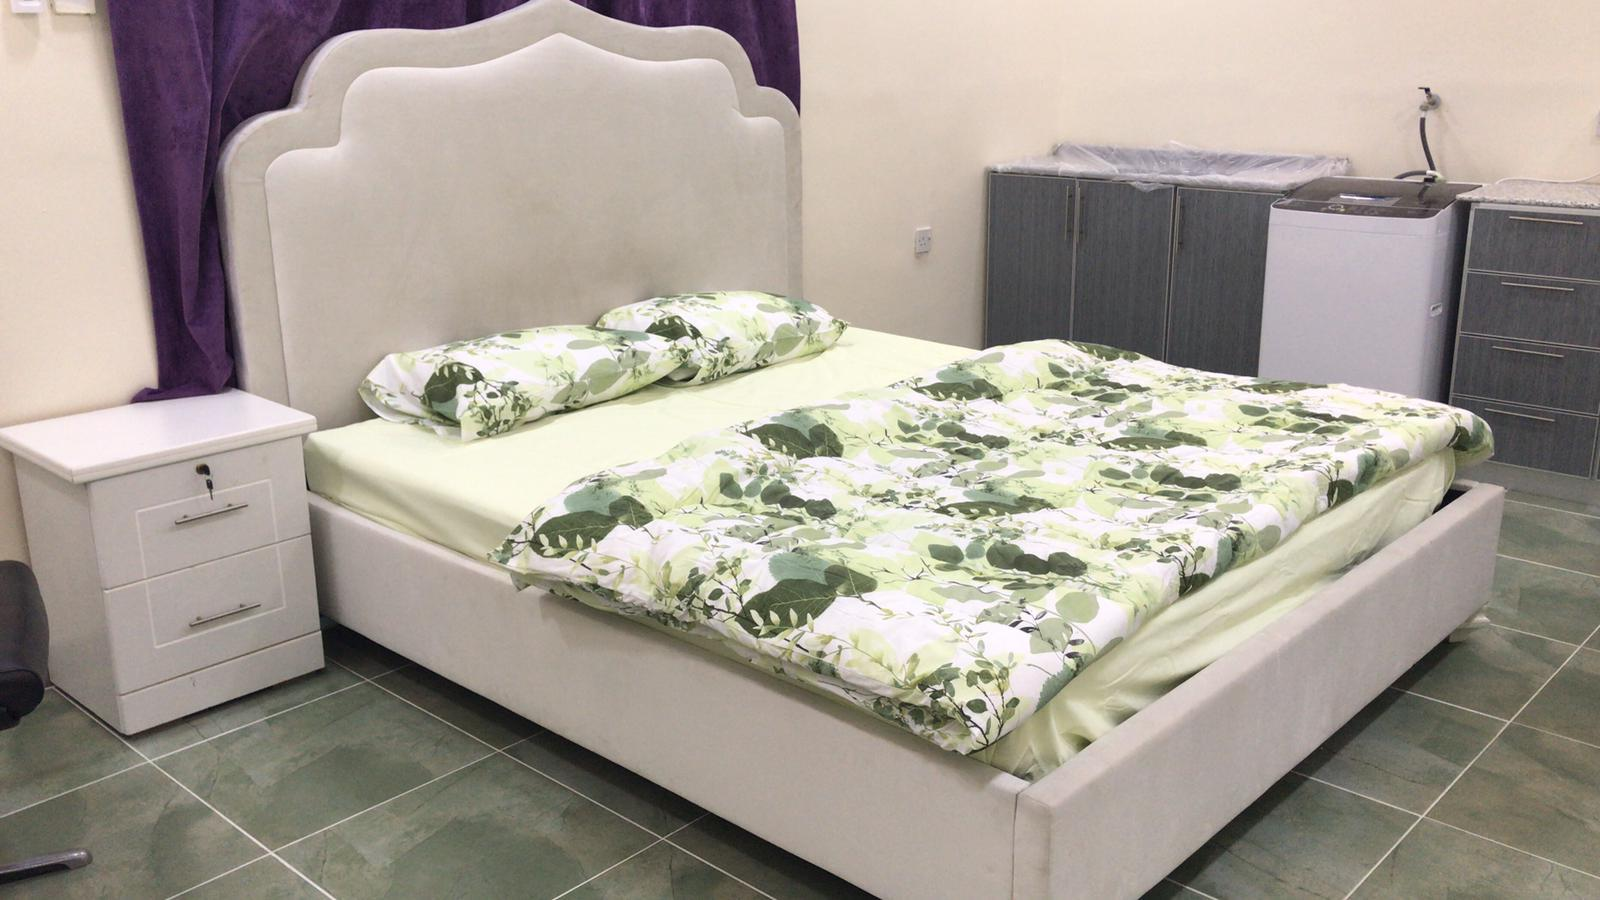 For rent a studio in Bu Ghazal Ref: BUG-AZ-001